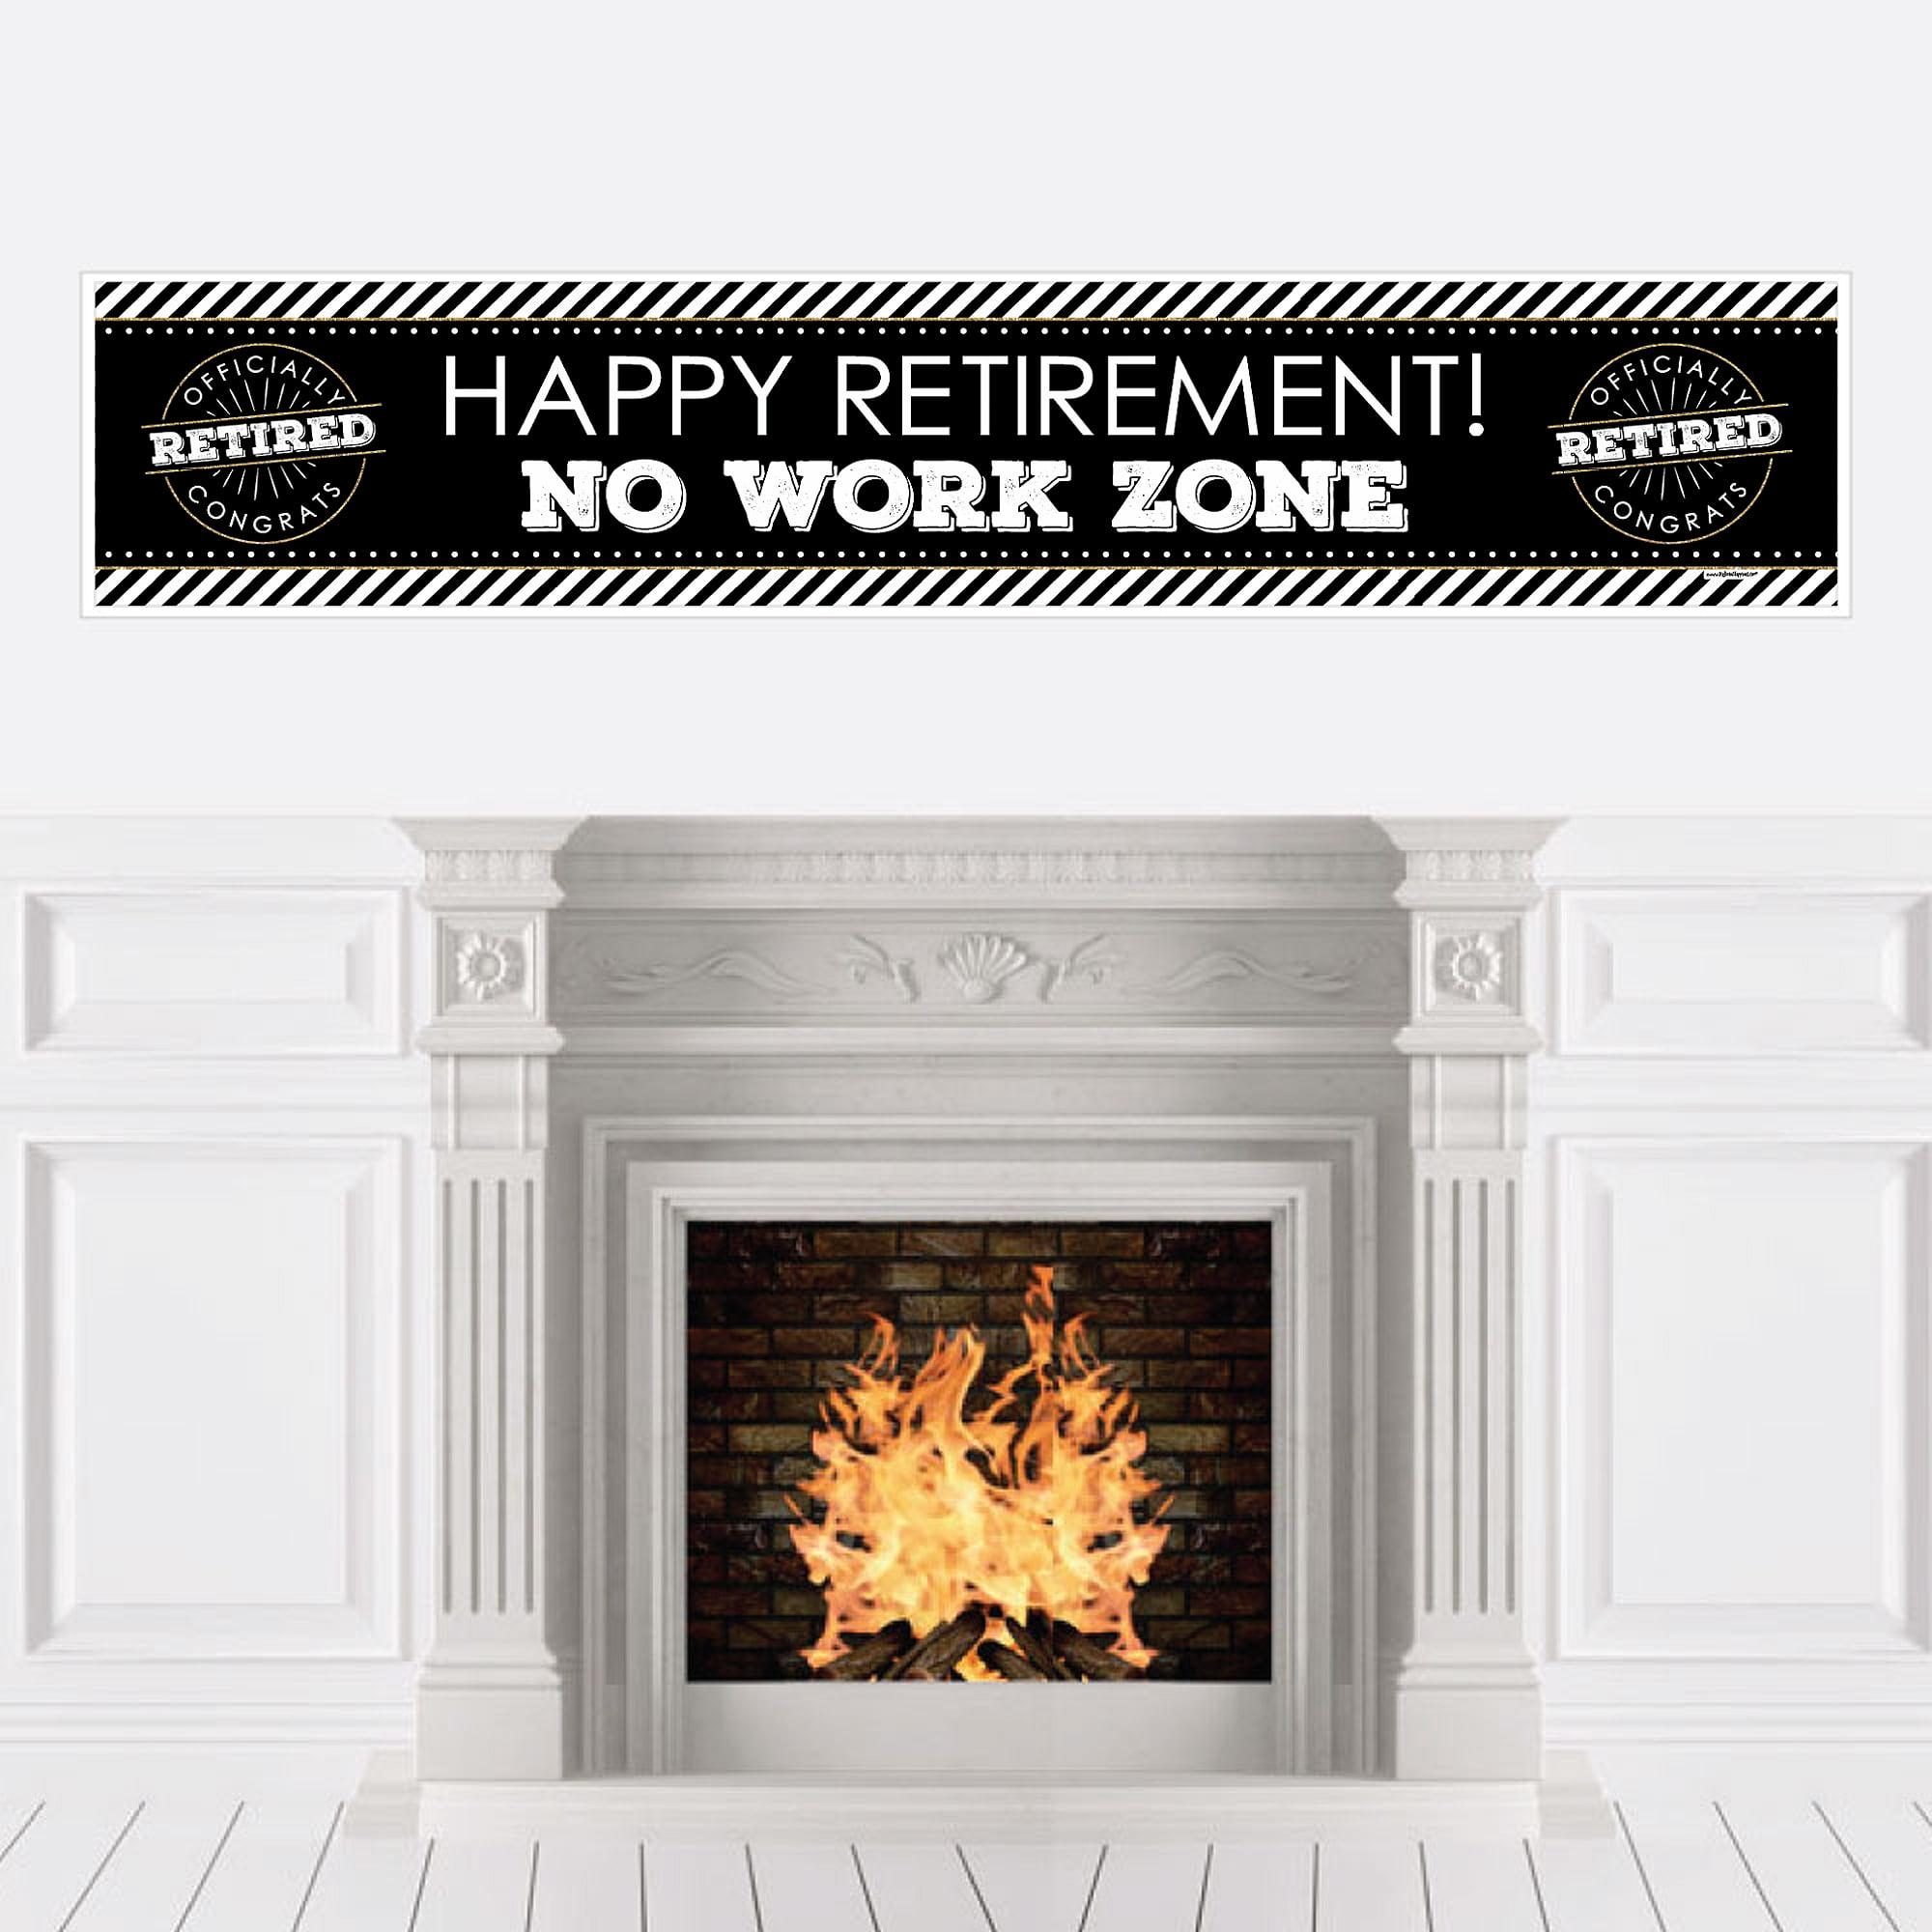 Happy Retirement - Retirement Party Decorations Party Banner